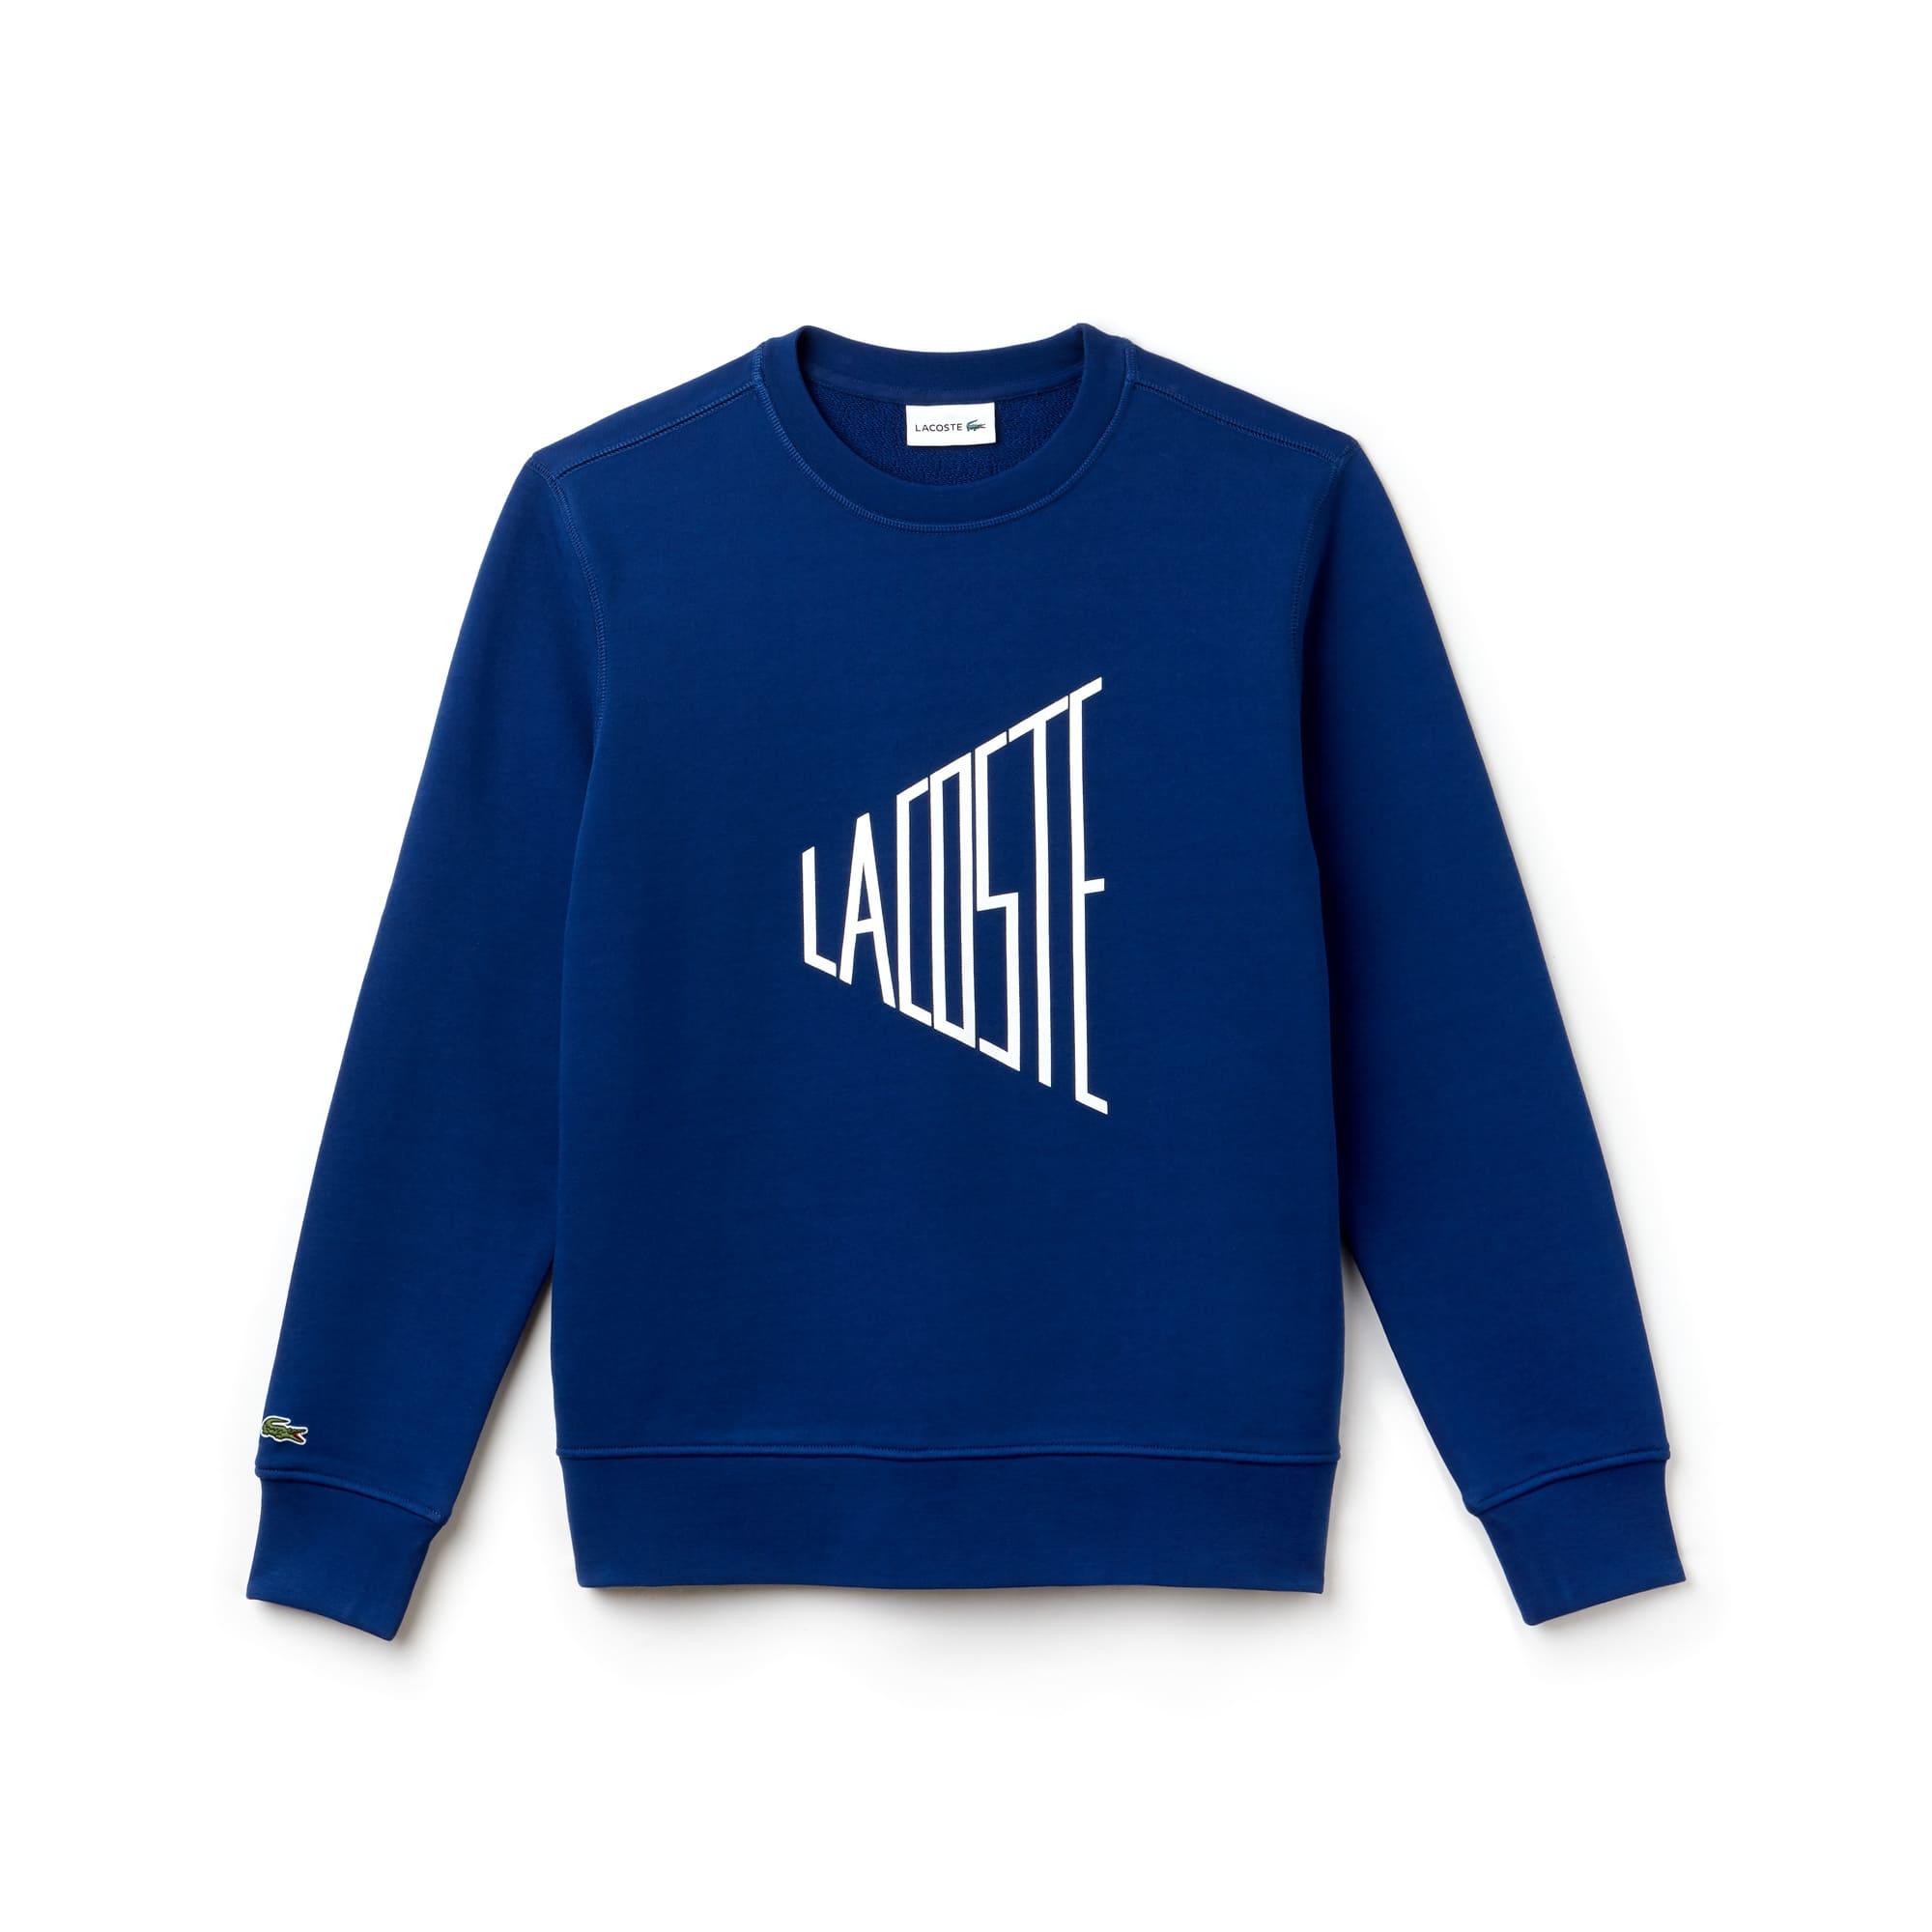 Sweatshirt col rond en molleton avec broderie Lacoste